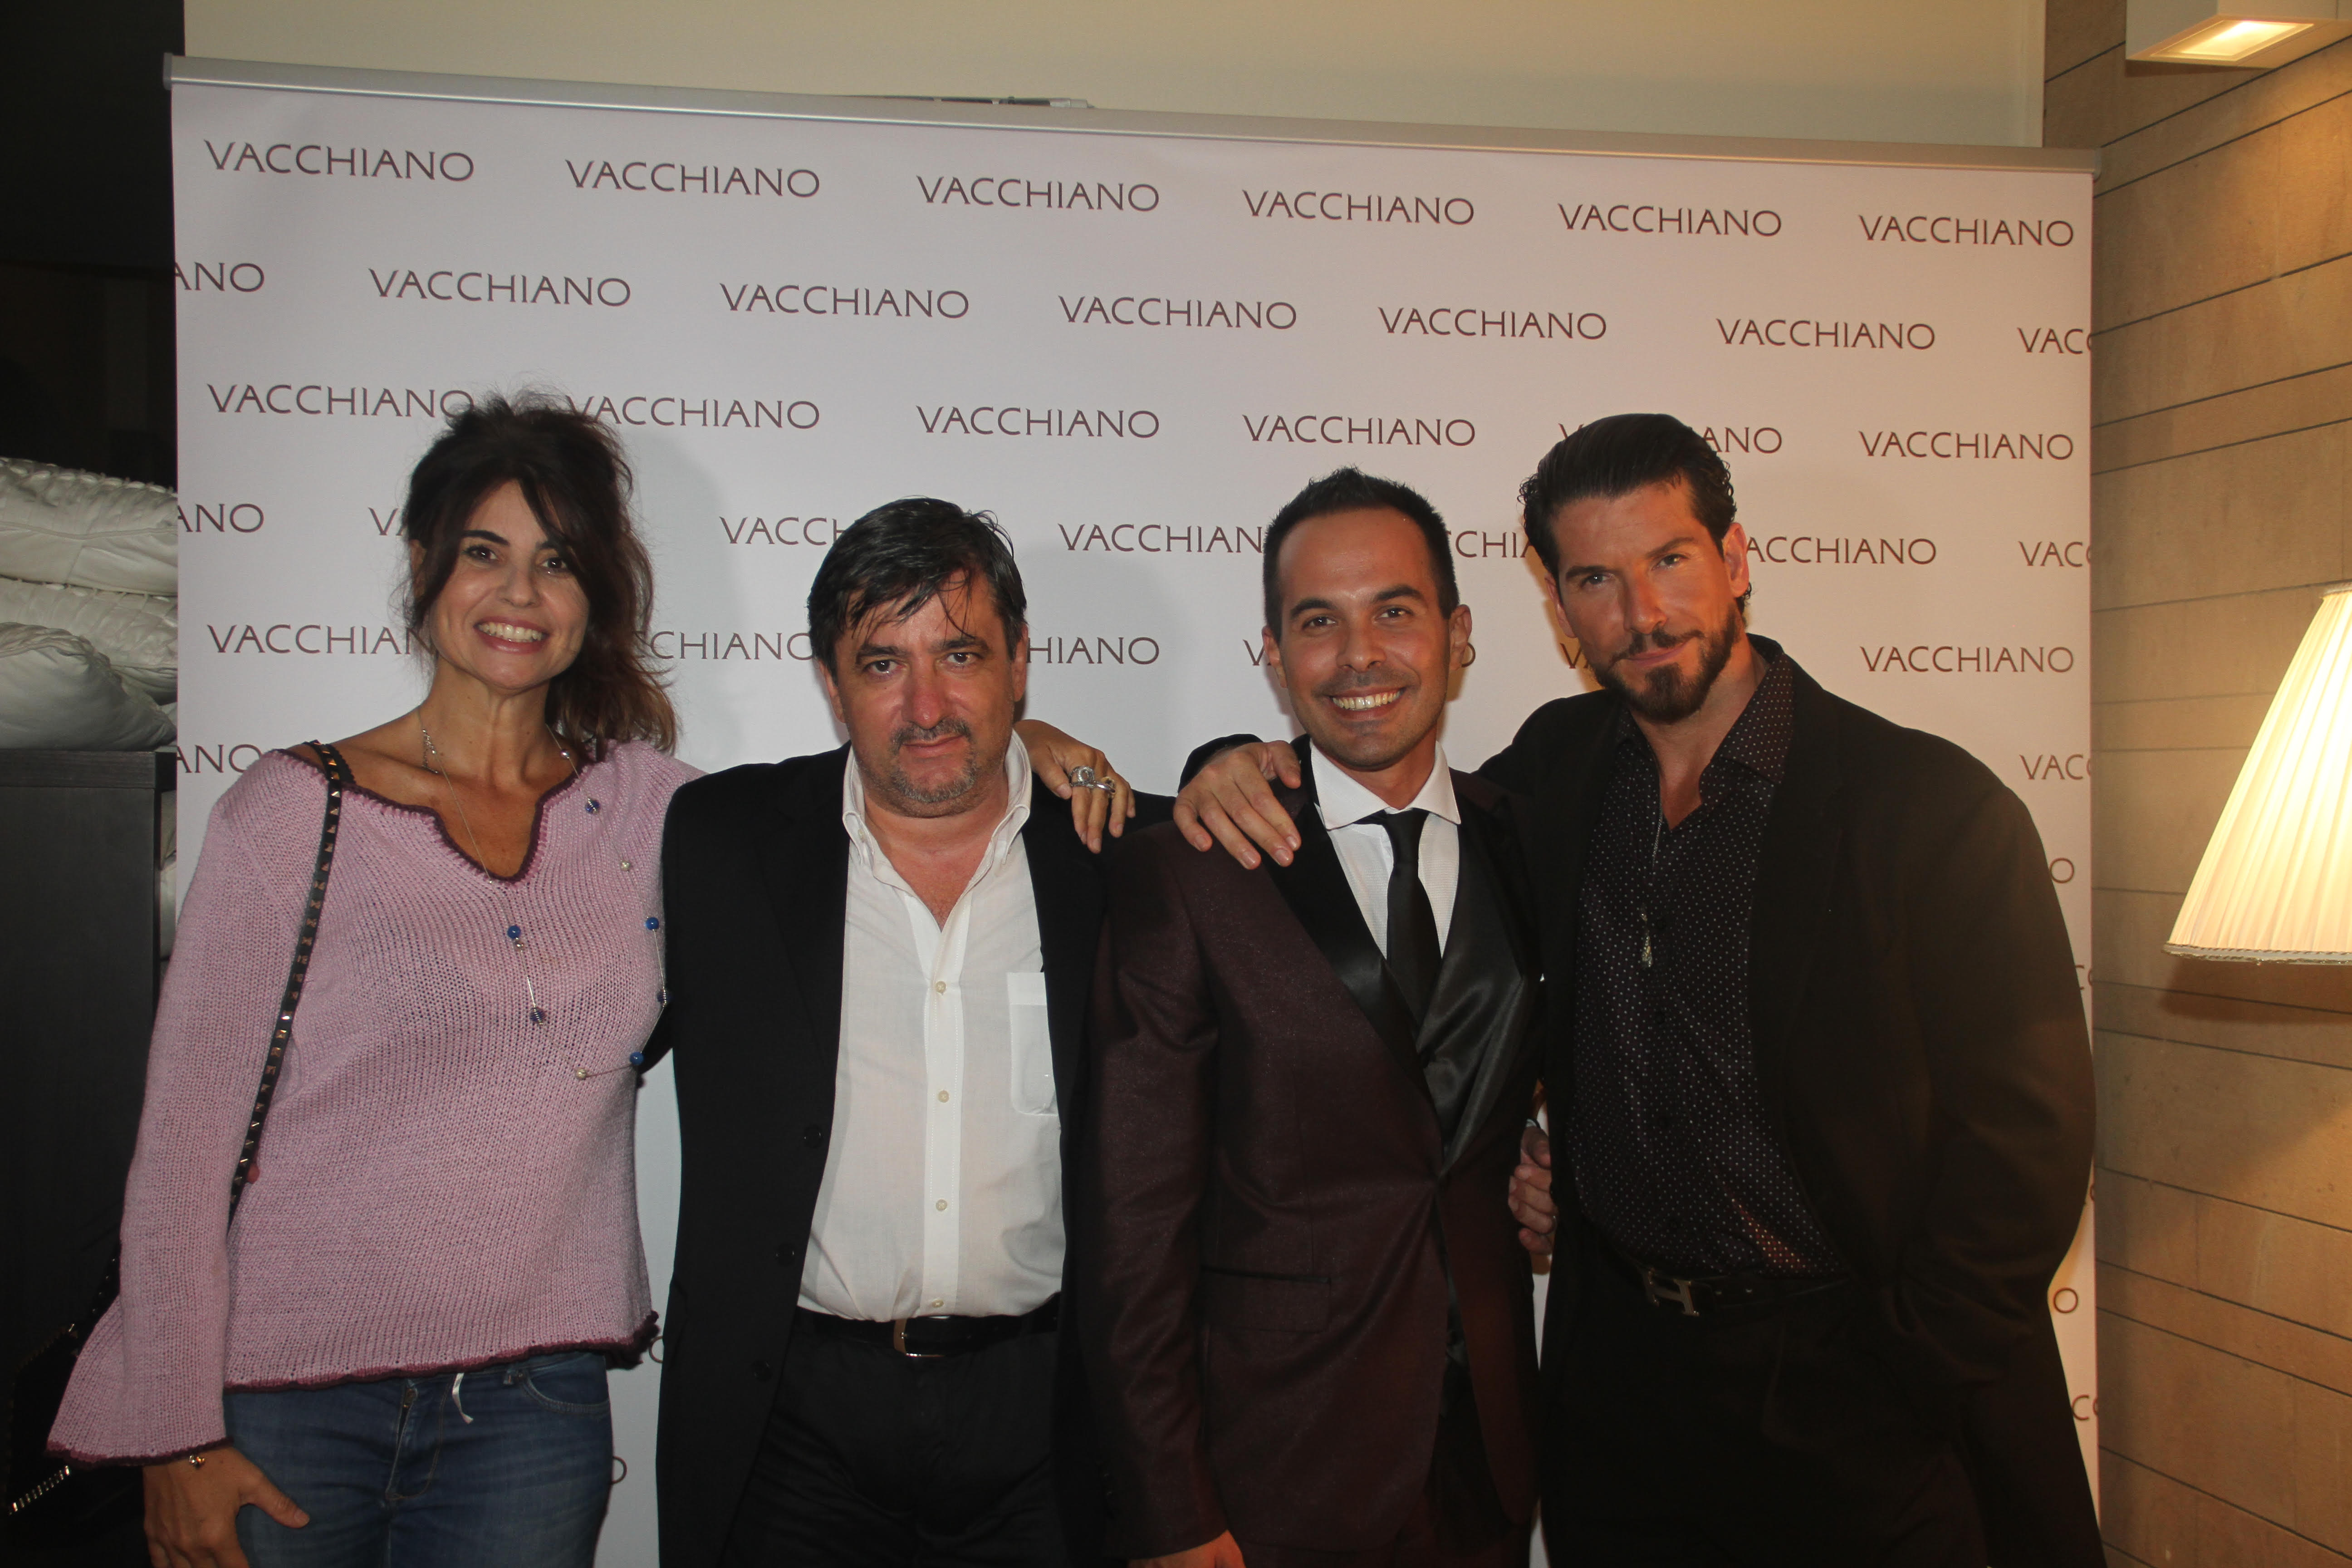 Francesca Nunzi, Angelo Frezza, Generoso Vacchiano, Jack Queralt